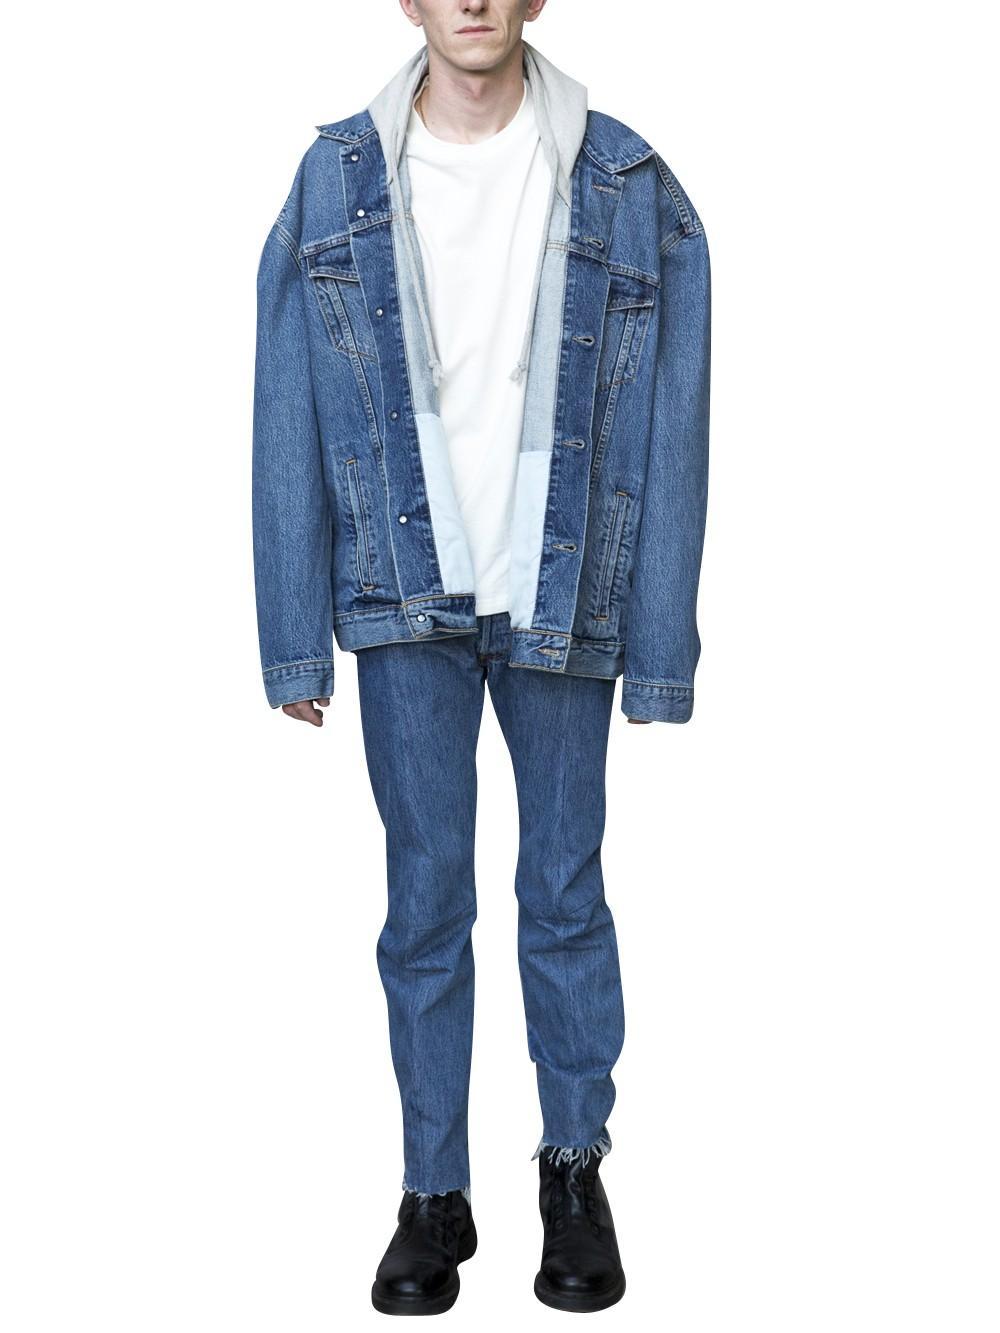 Vetements X Levis Denim Jacket in Blue for Men